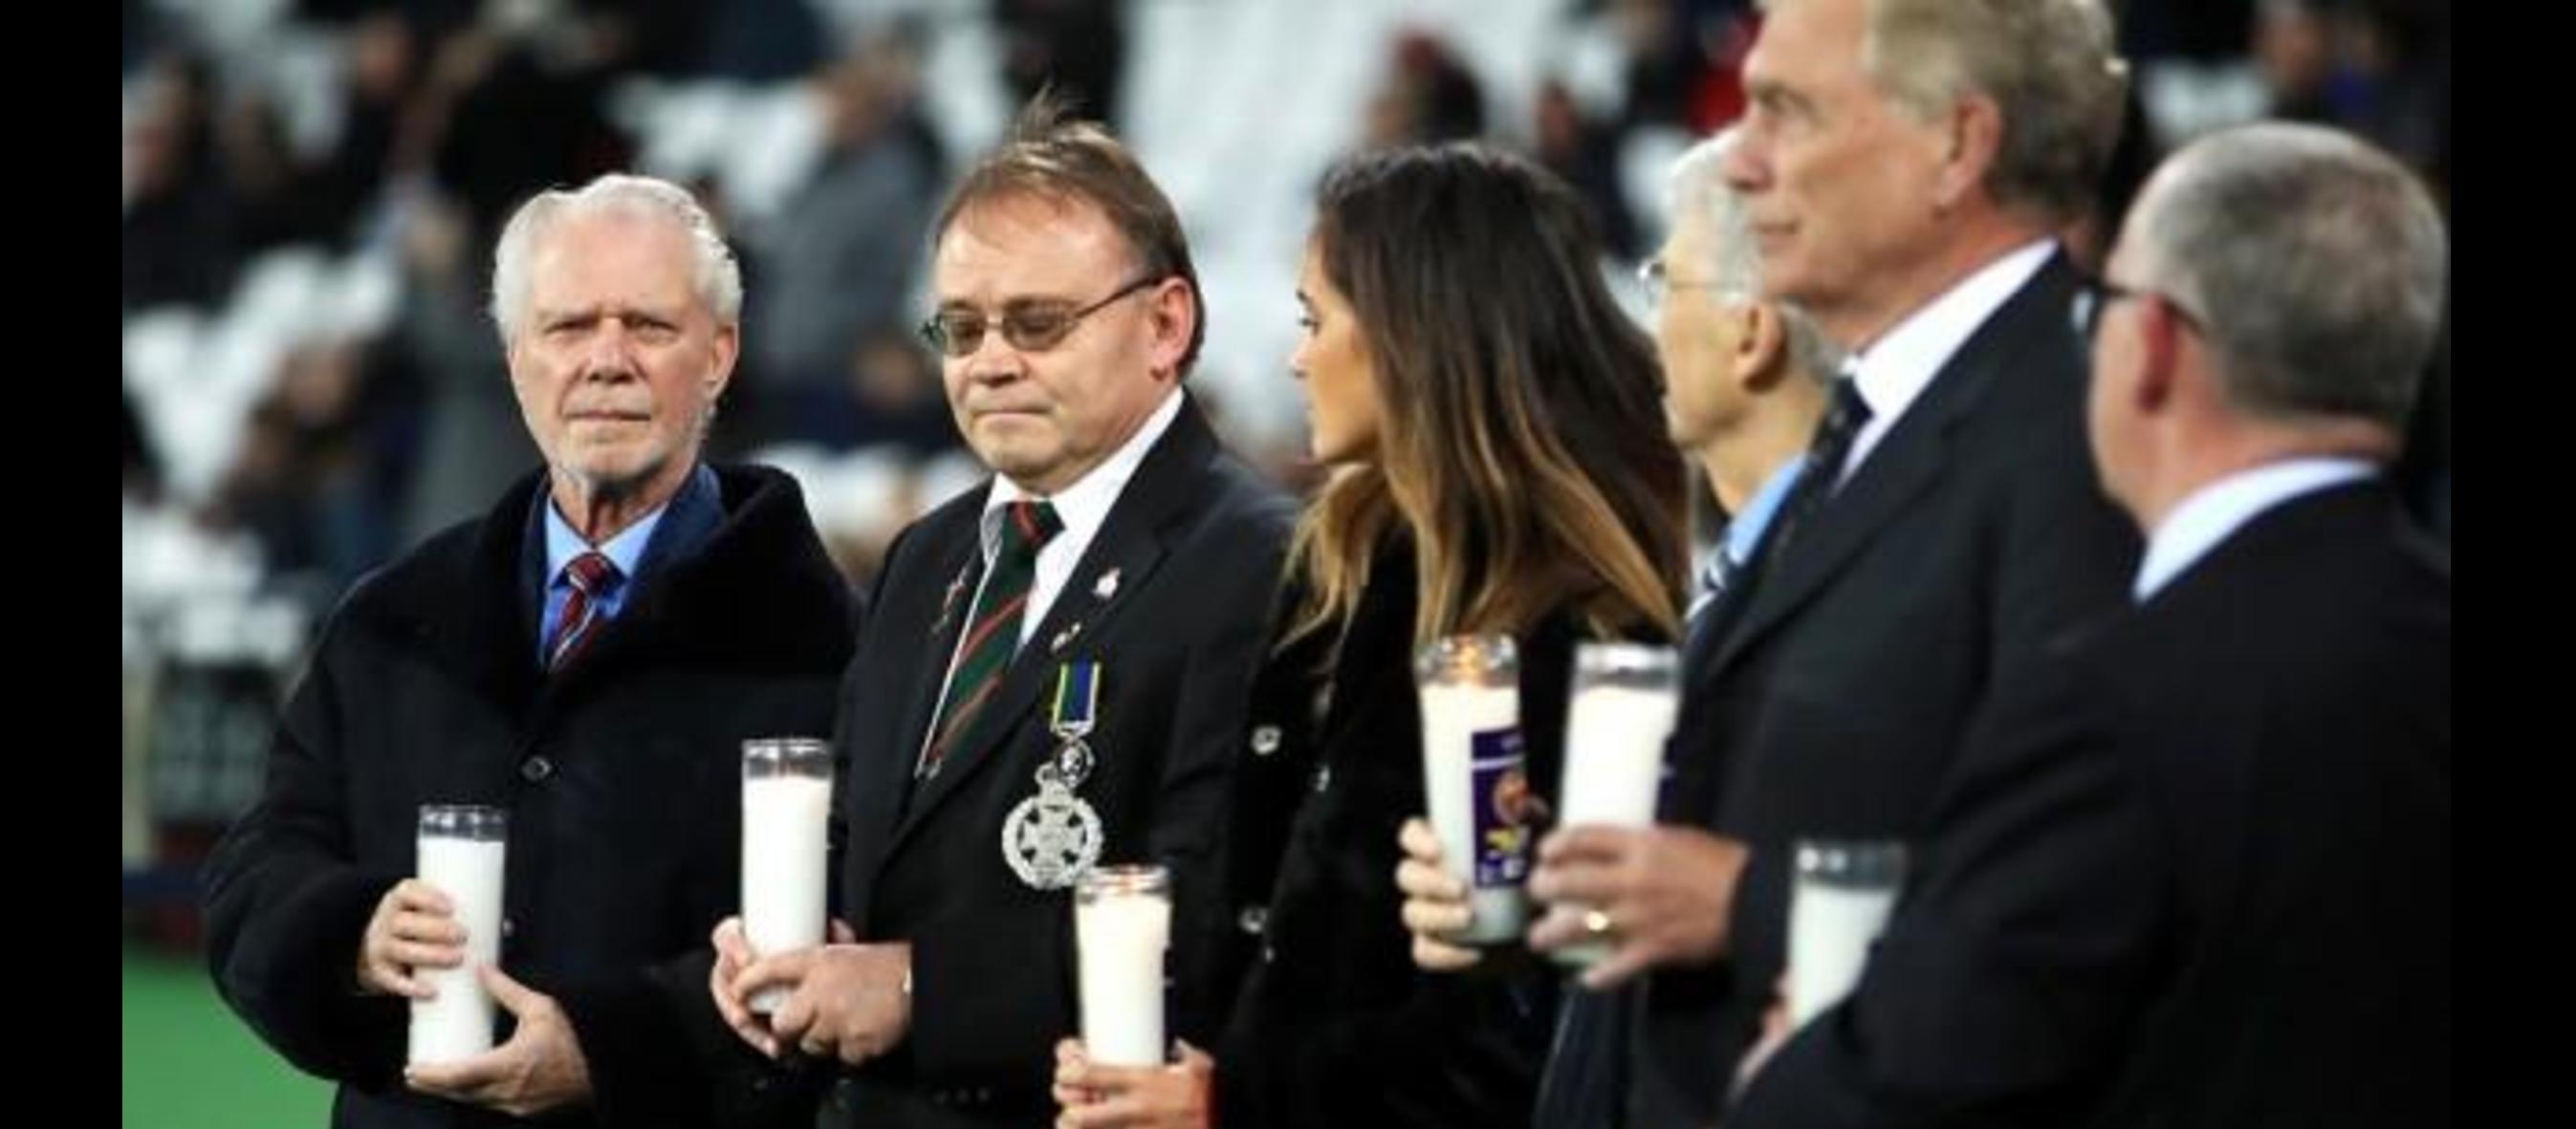 West Ham United commemorates Holocaust before match